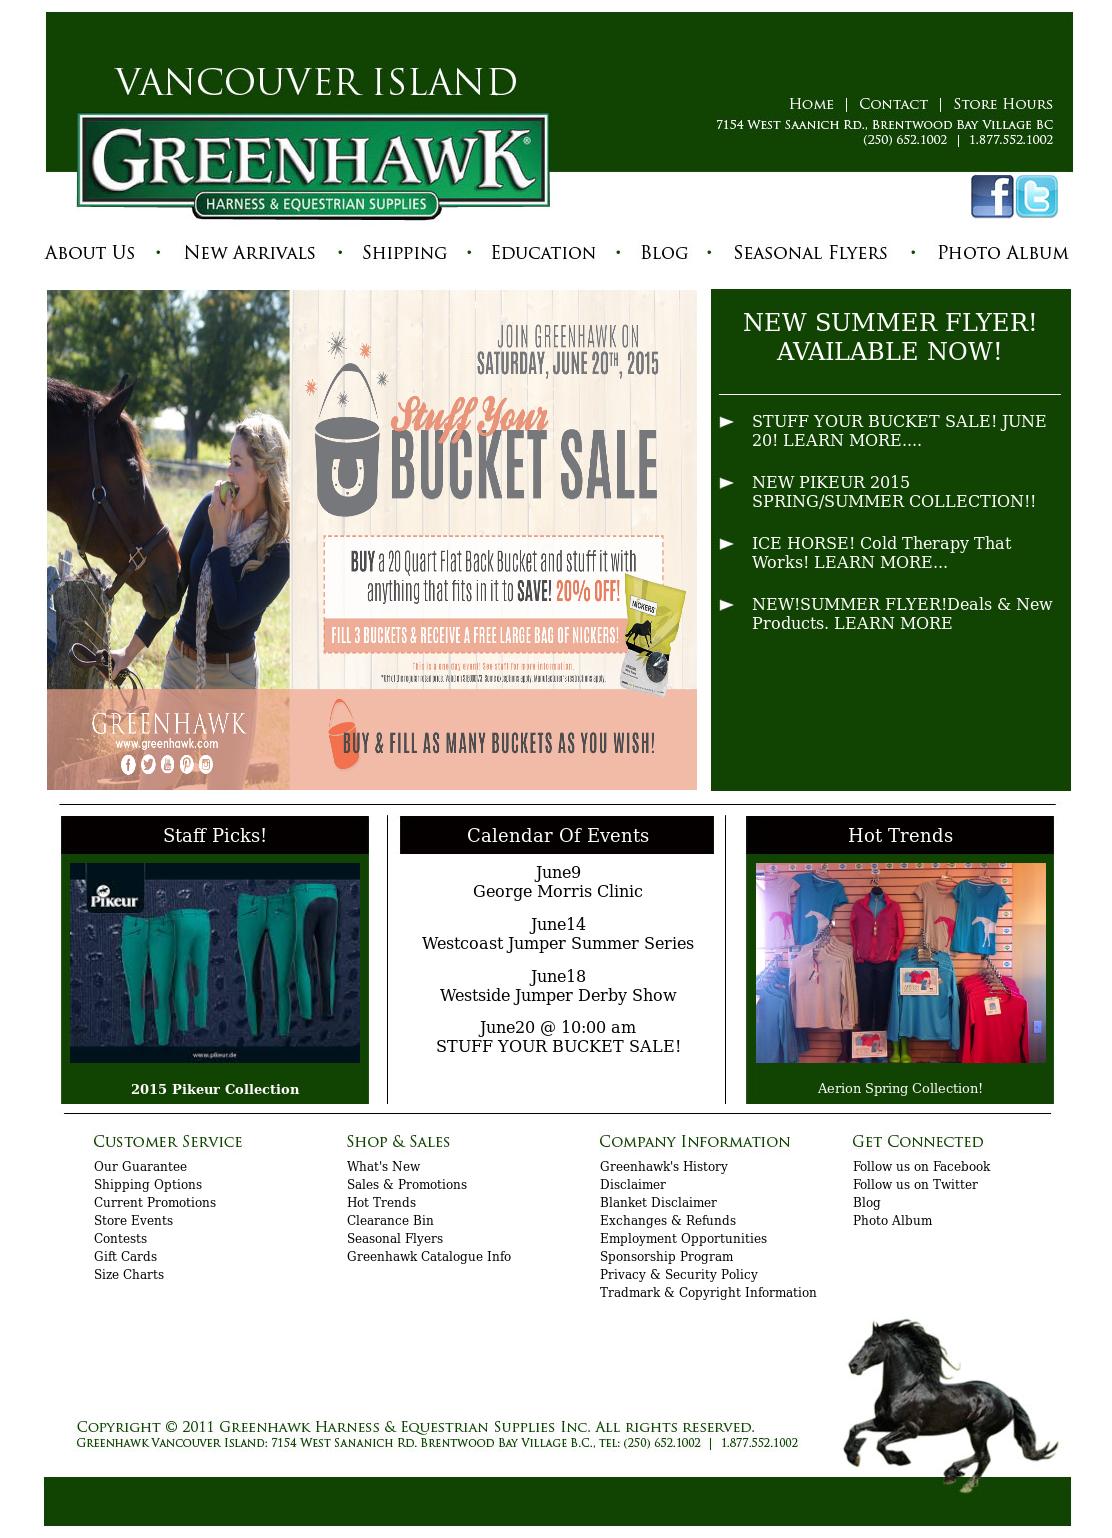 Greenhawk Vancouver Island Competitors, Revenue and